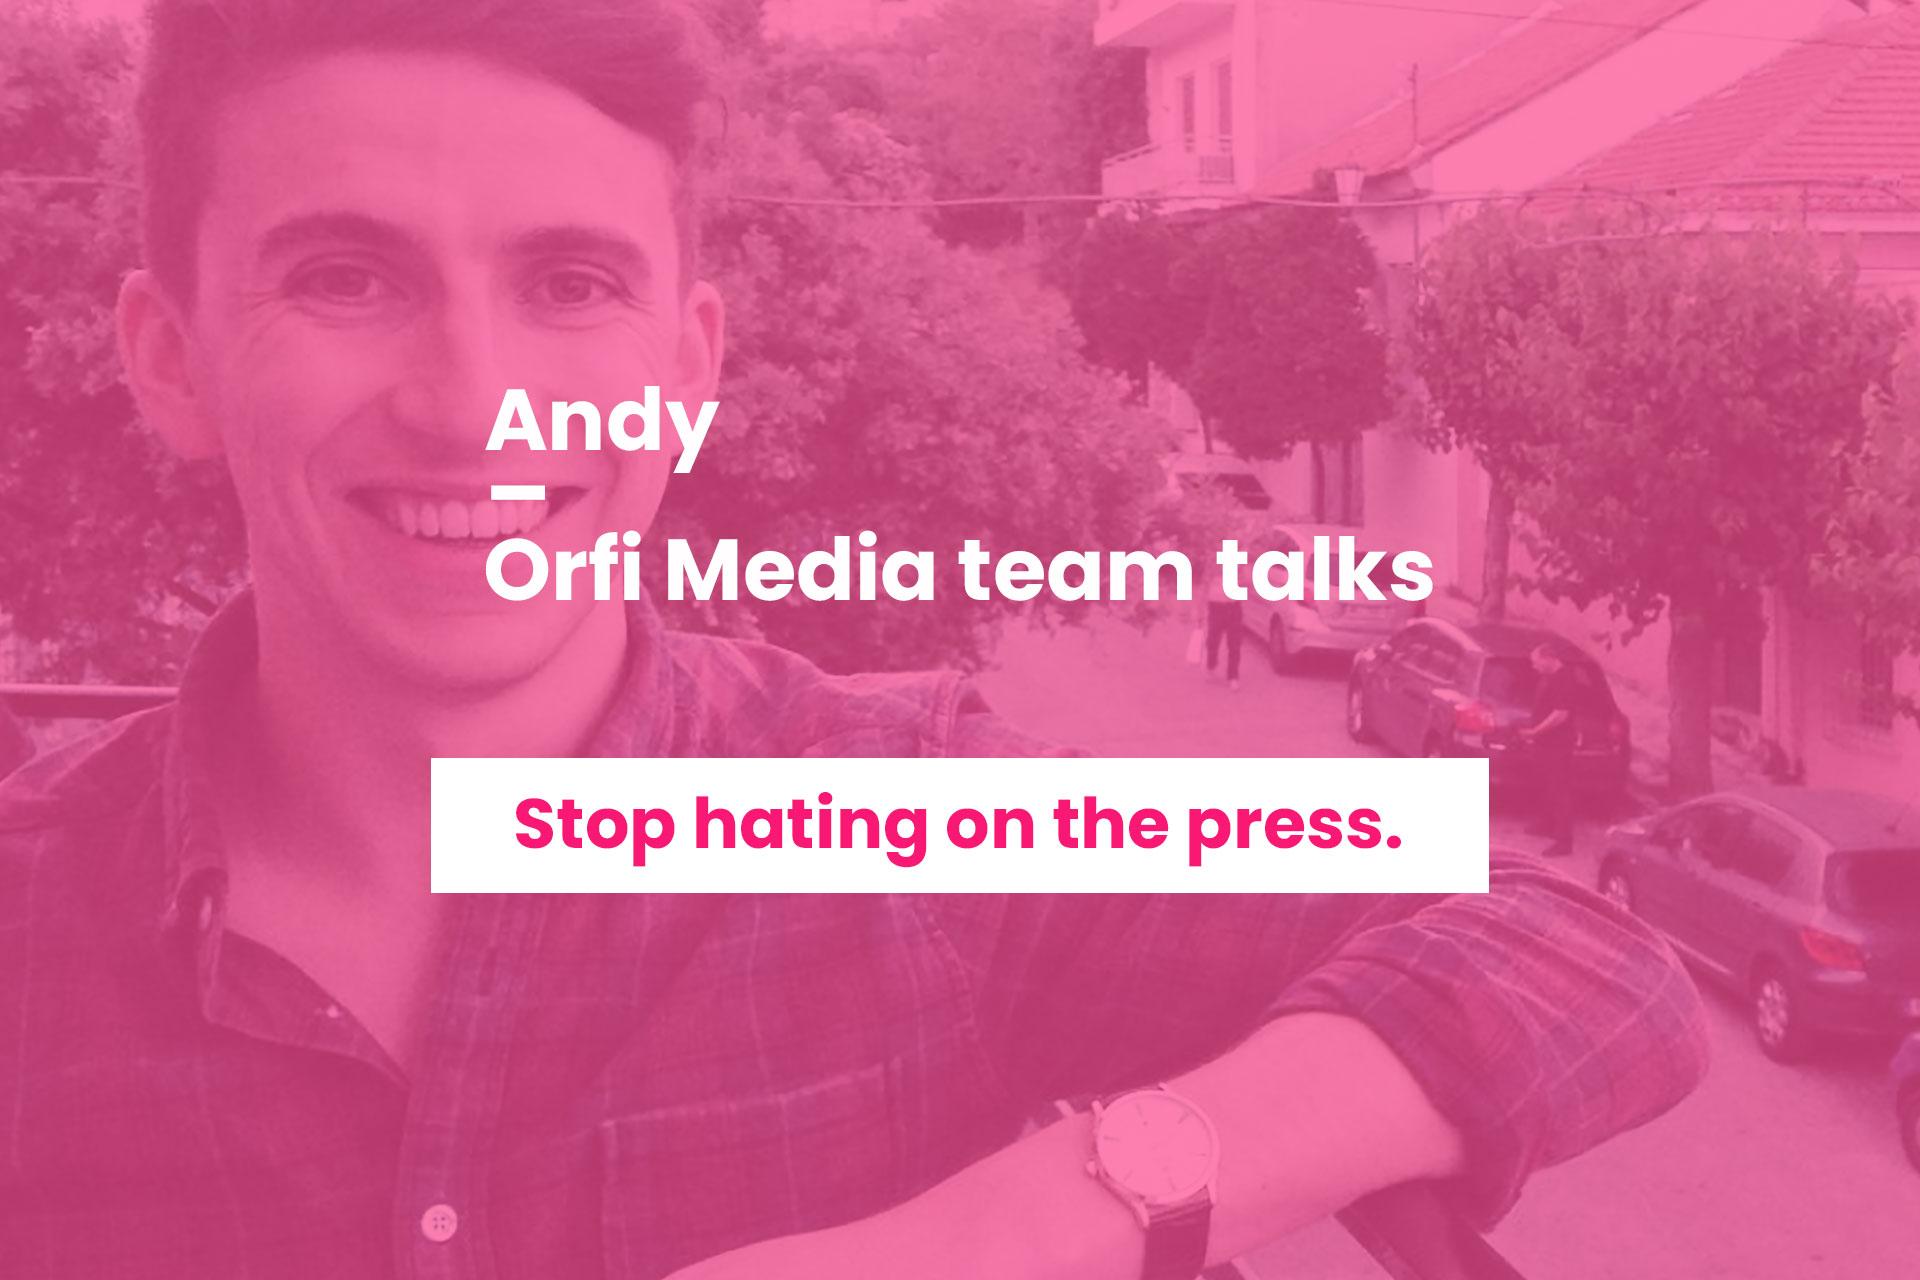 Orfi Media team talks Andy Donley